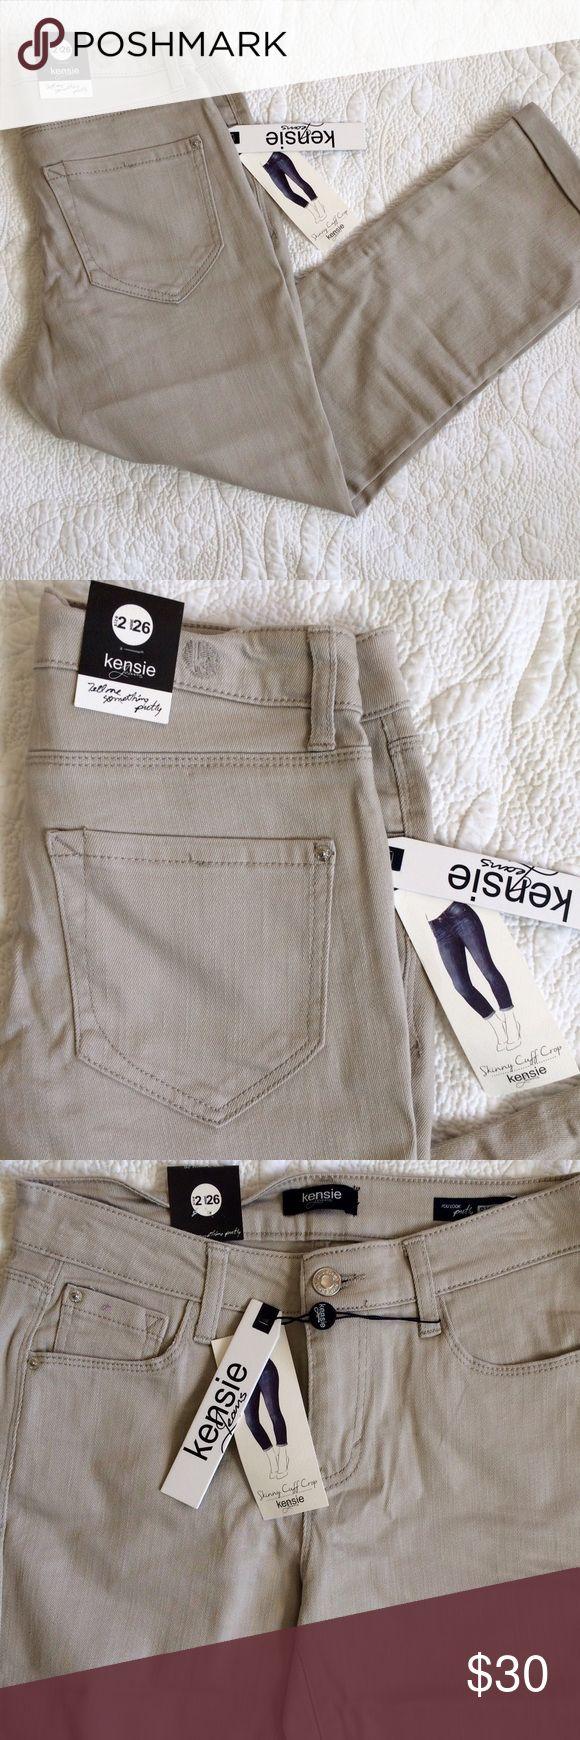 Kensie Jeans Taupe Skinny Cuff Crop NWT - Kensie Jeans NWT - Skinny Cuff Crop  - Size 2 Waist 26 - Inseam length pictured - Cotton/Spandex blend - No Trades Kensie Jeans Ankle & Cropped